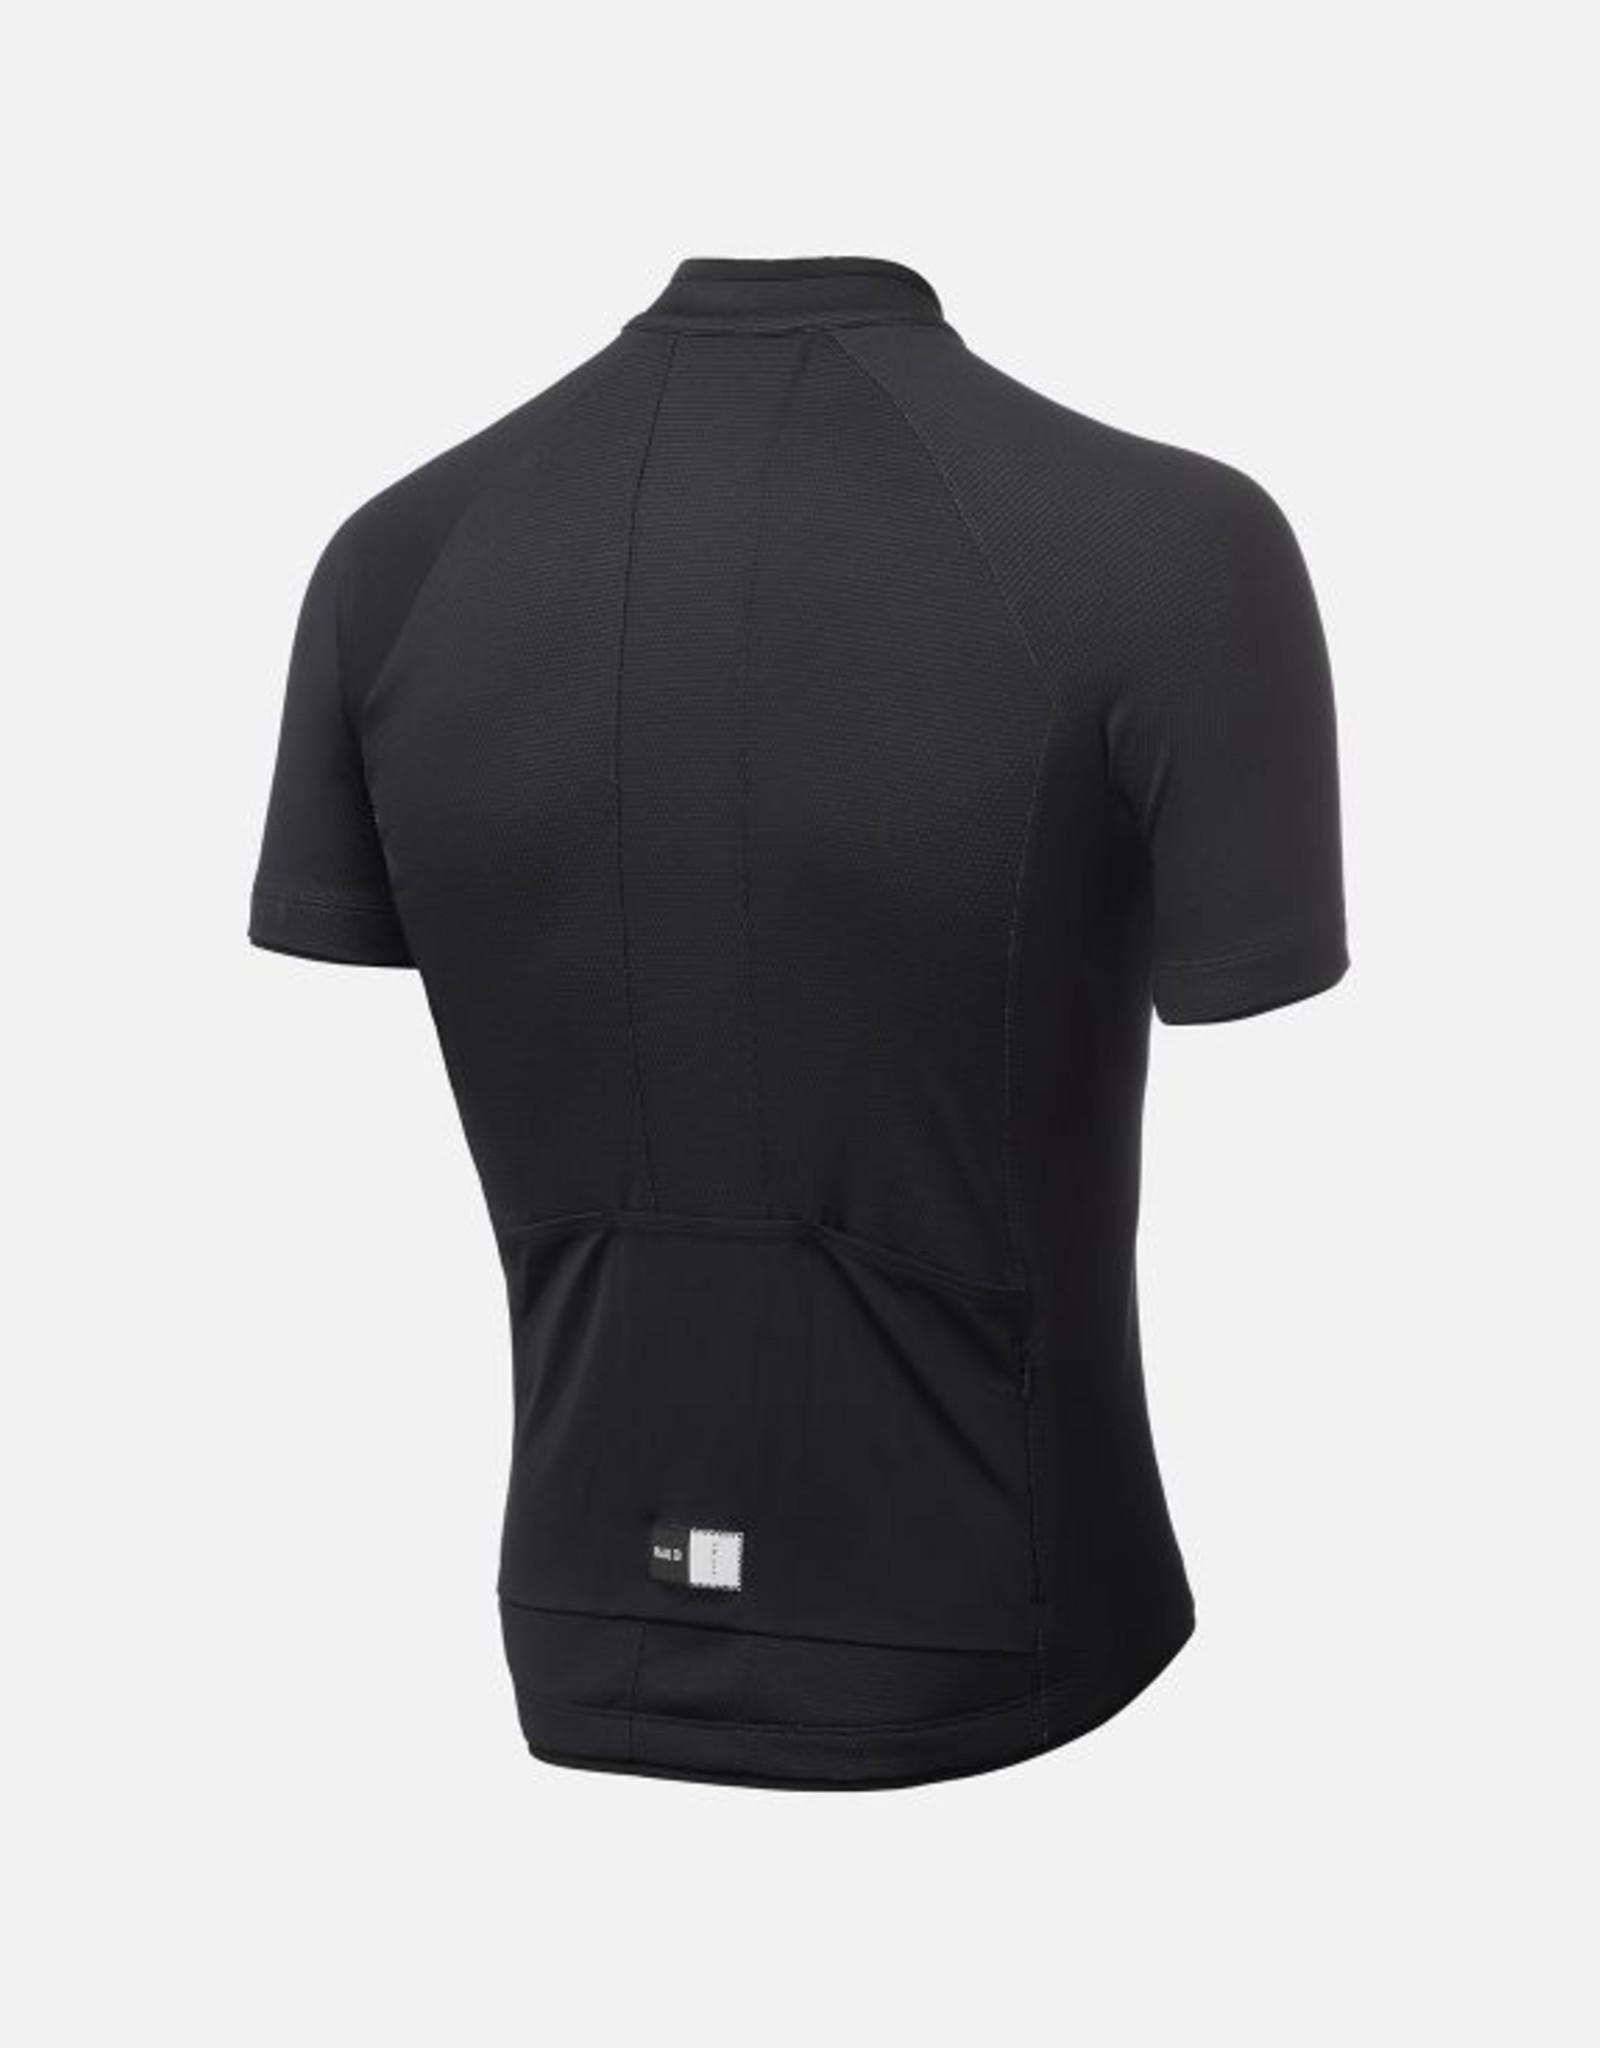 Pedal Ed Narita Carbon Jersey - Black